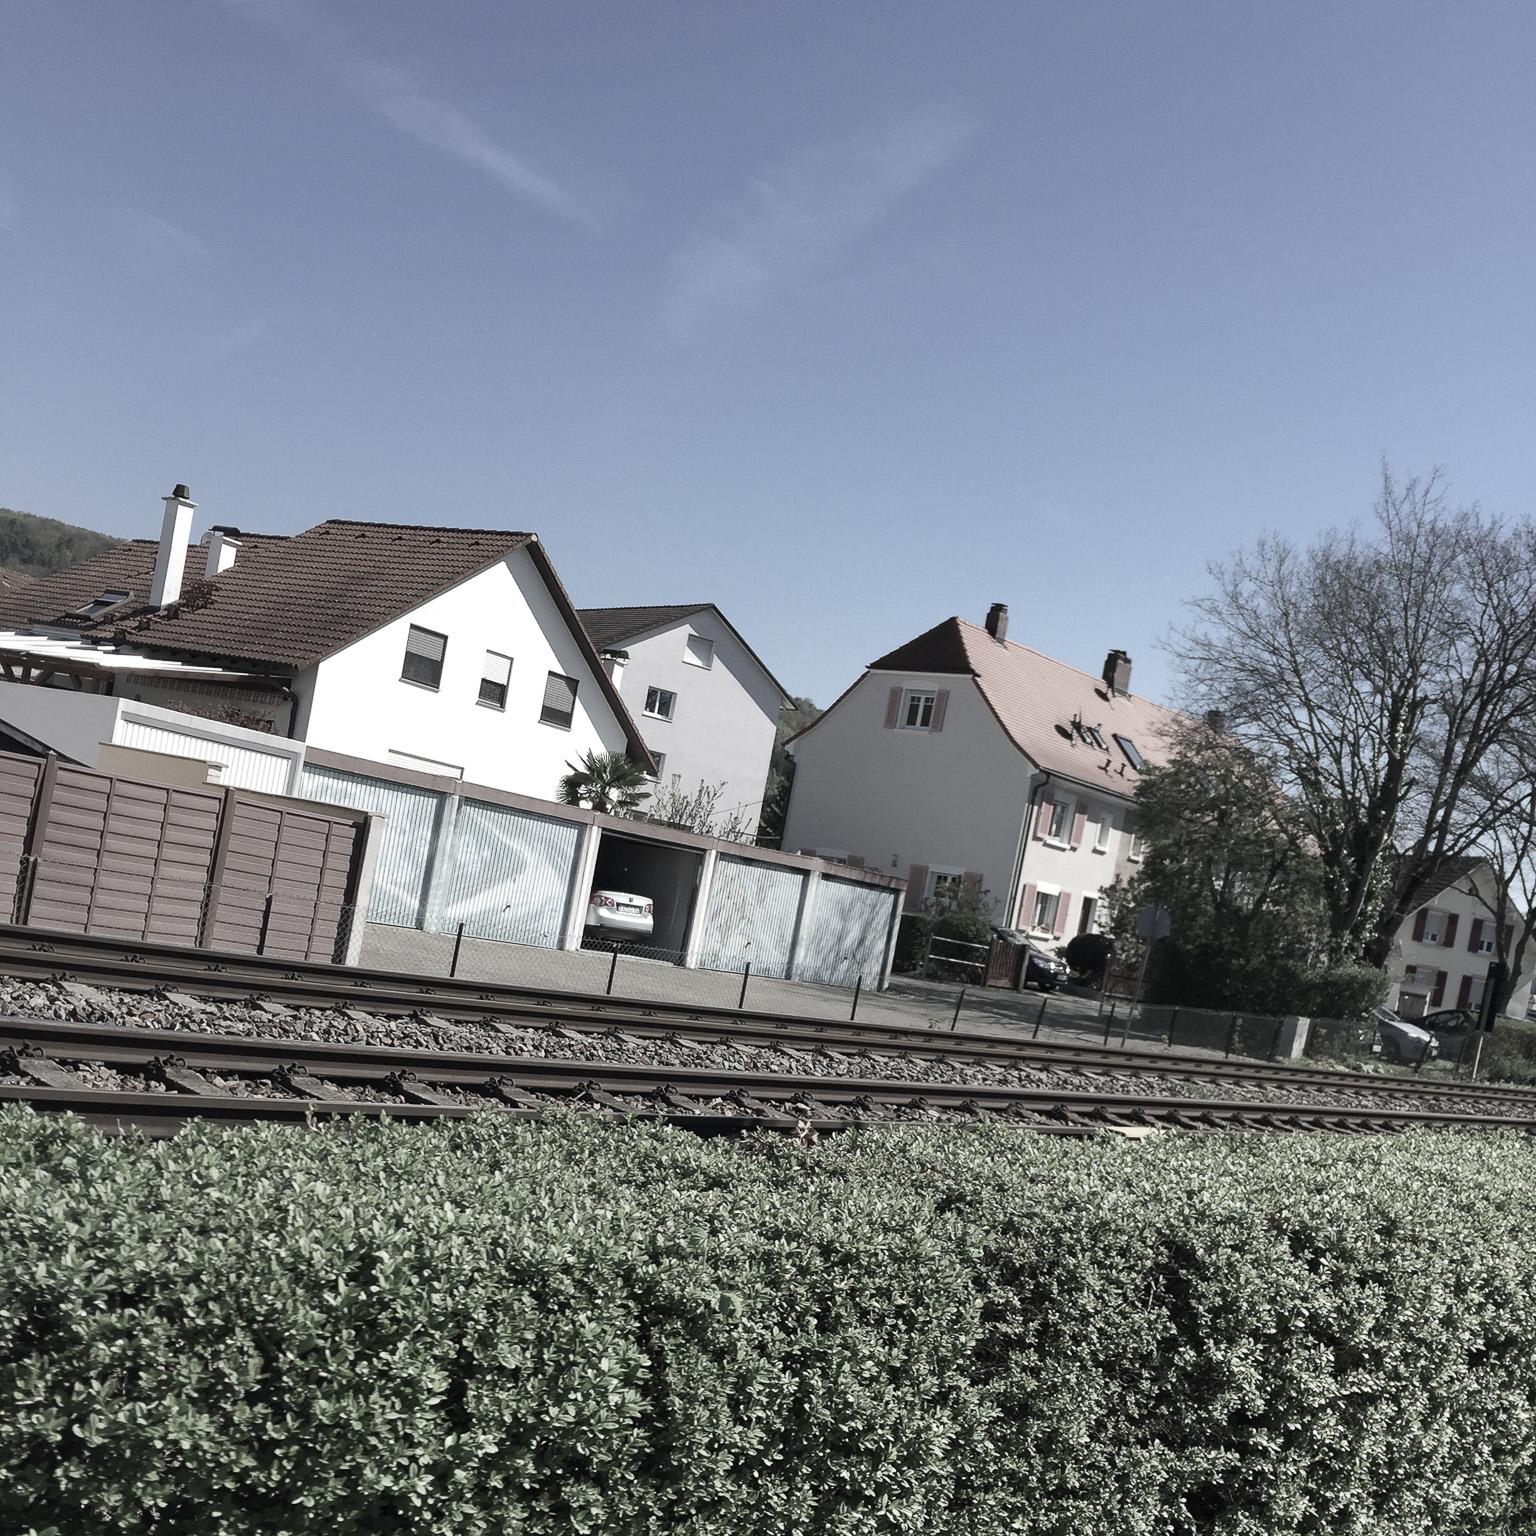 17-Rhein-0013-P-1504.jpg